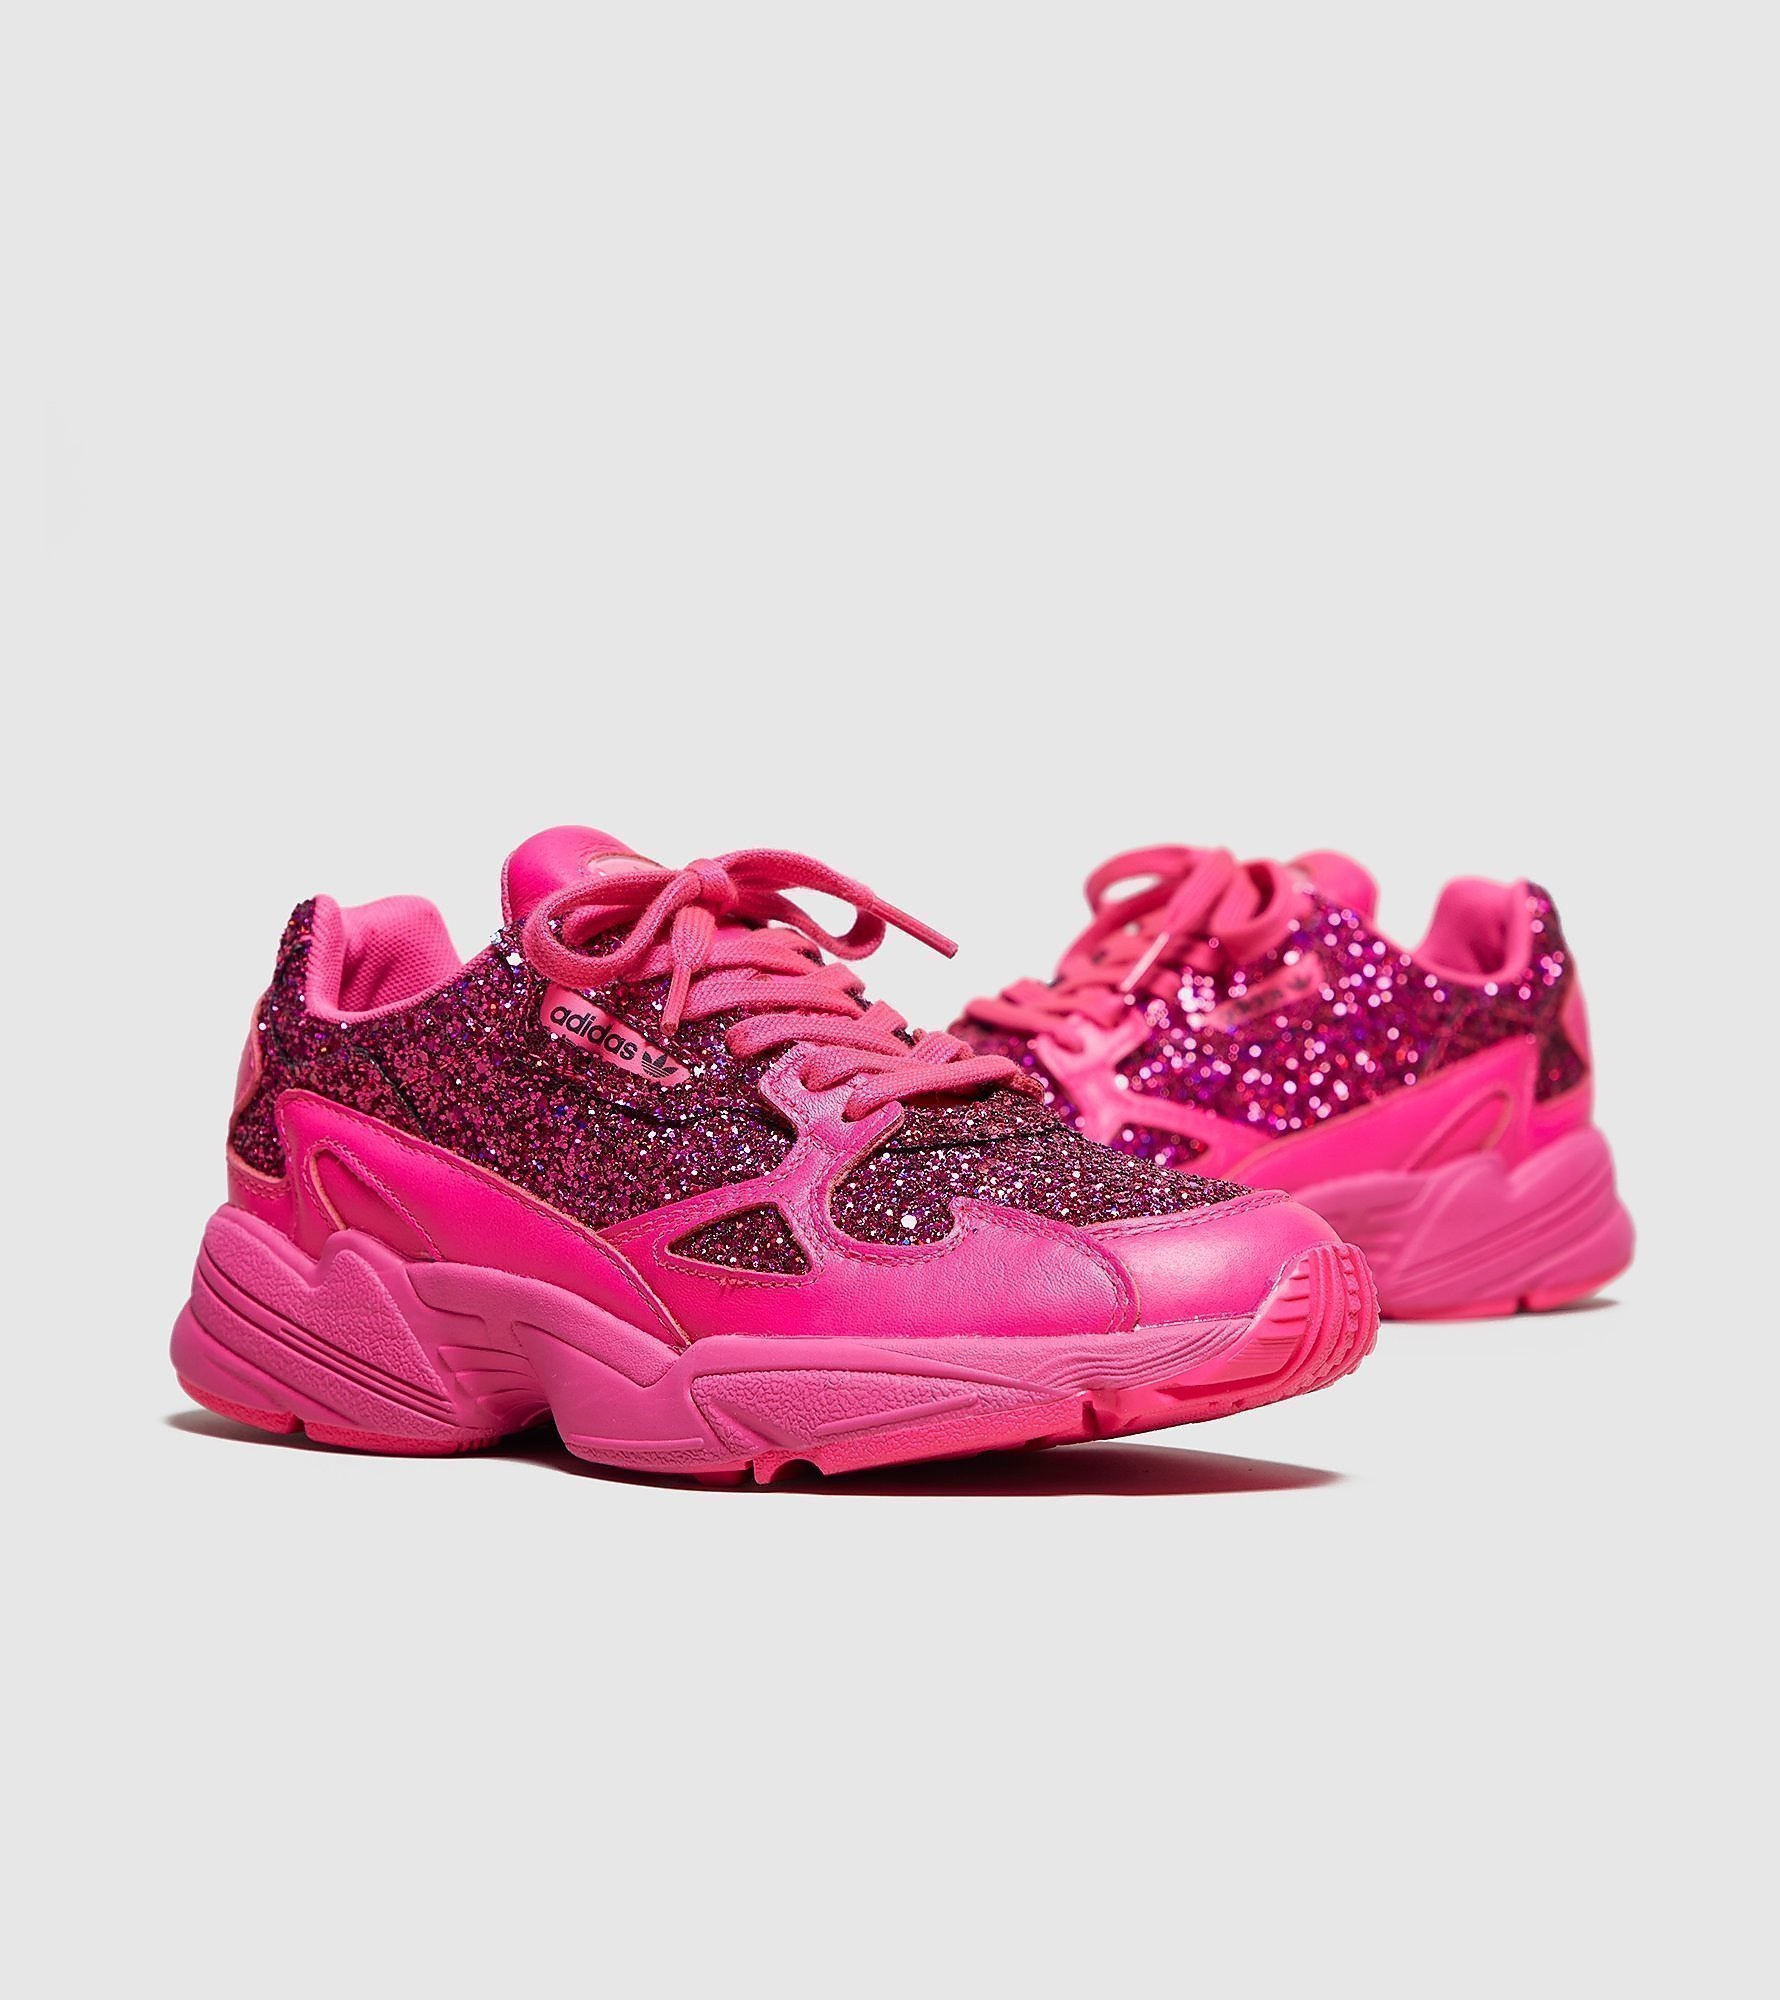 buy online 5bb35 097b8 adidas Originals Falcon Womens Out Loud (roze). Stijlcode BD8077. adidas  Originals Falcon Womens  ...